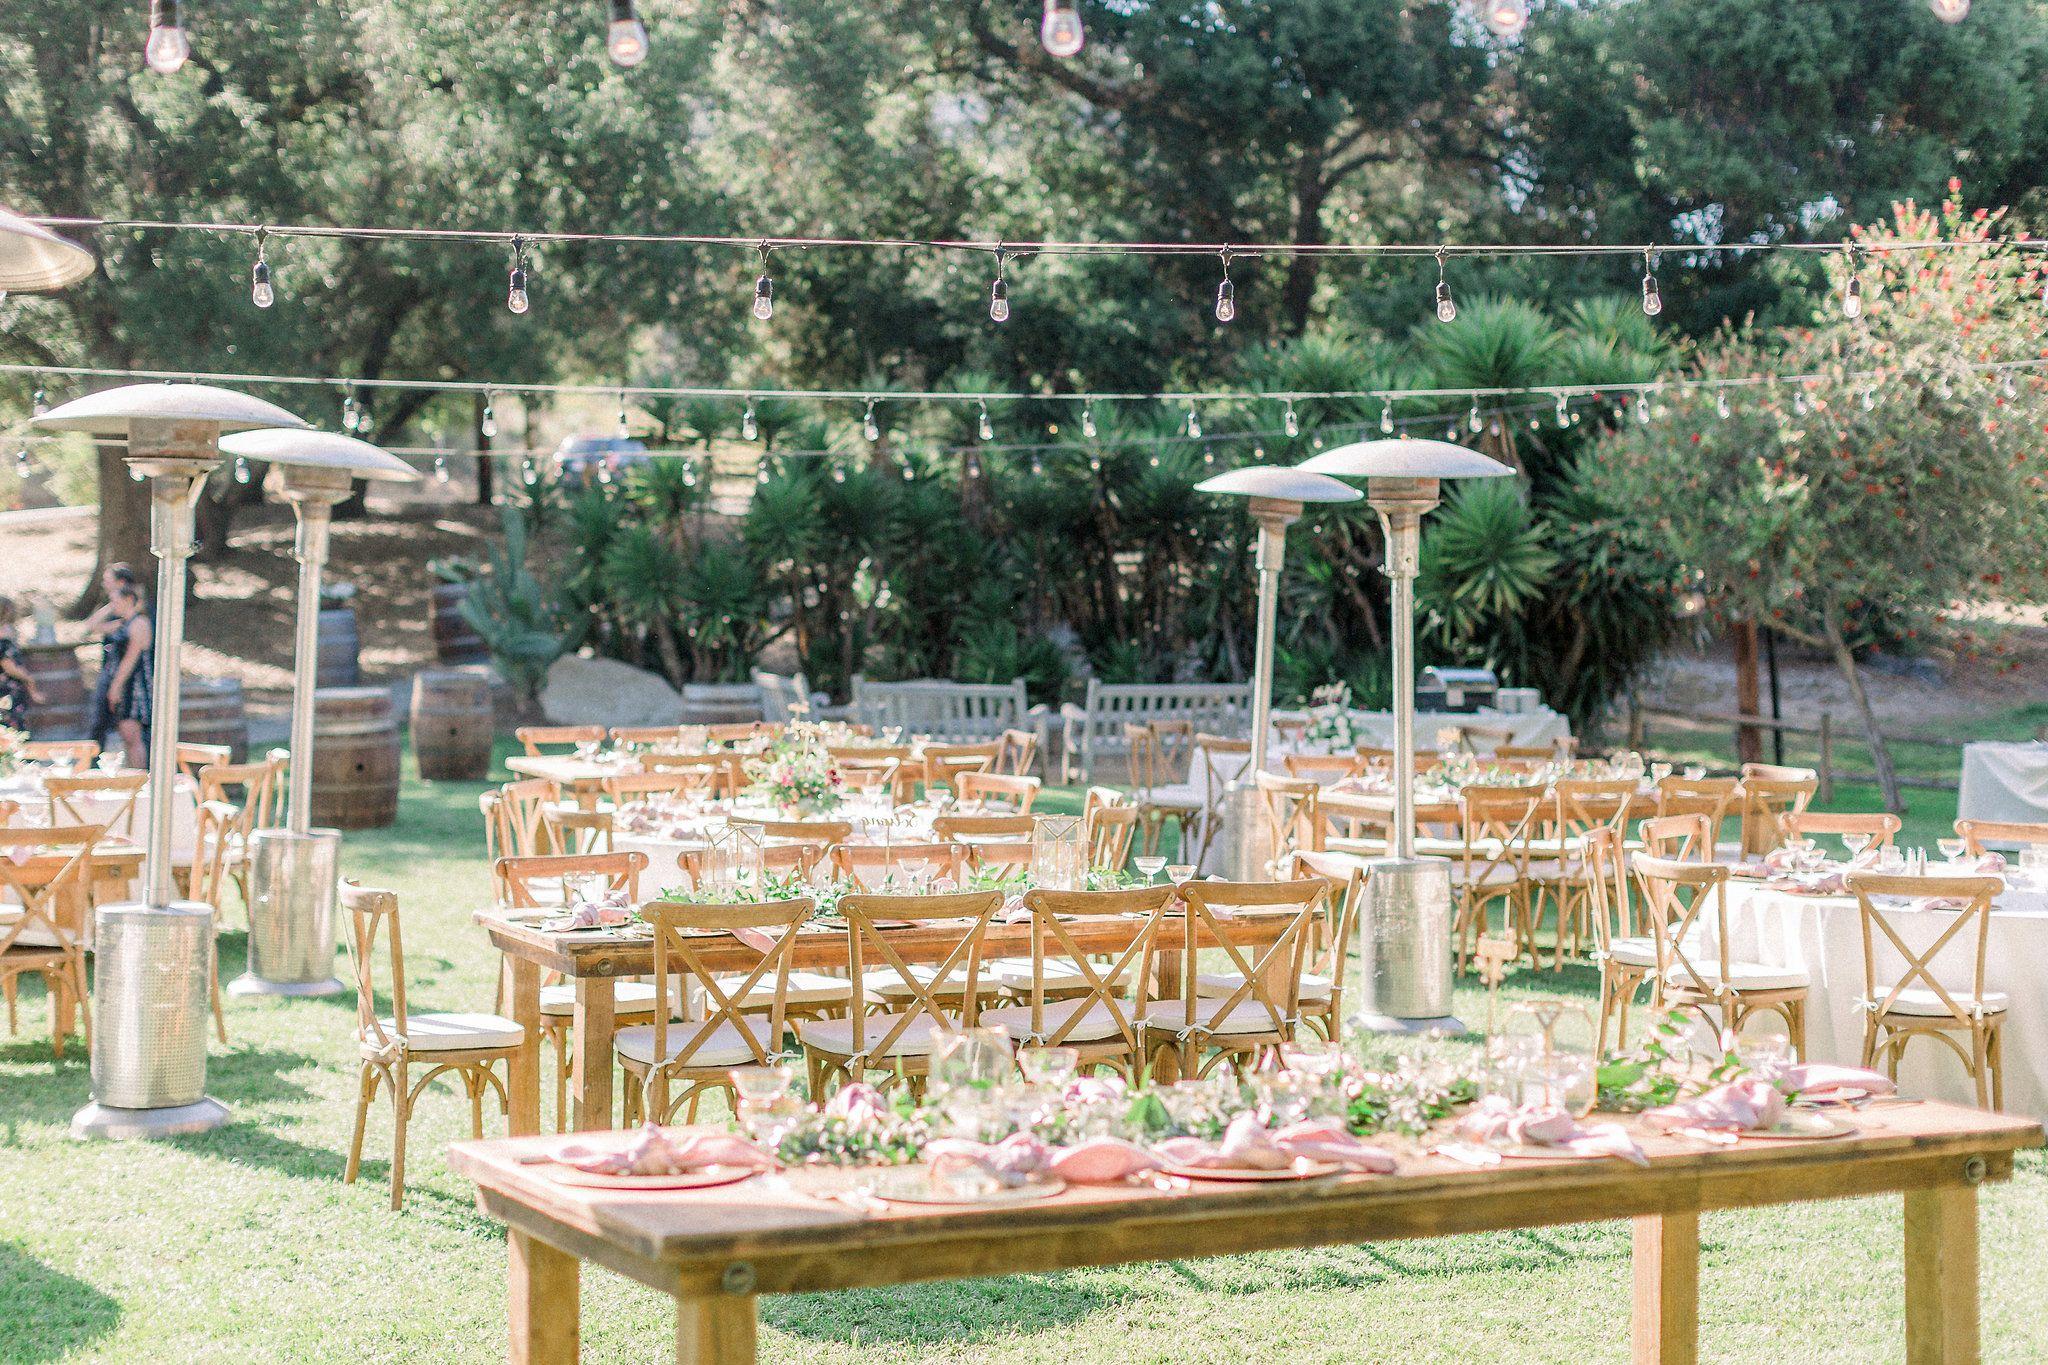 Farm Tables And More Southern California Wedding Rentals Wedding Reception Rustic Wedding Southern California Garden Wedding California Wedding